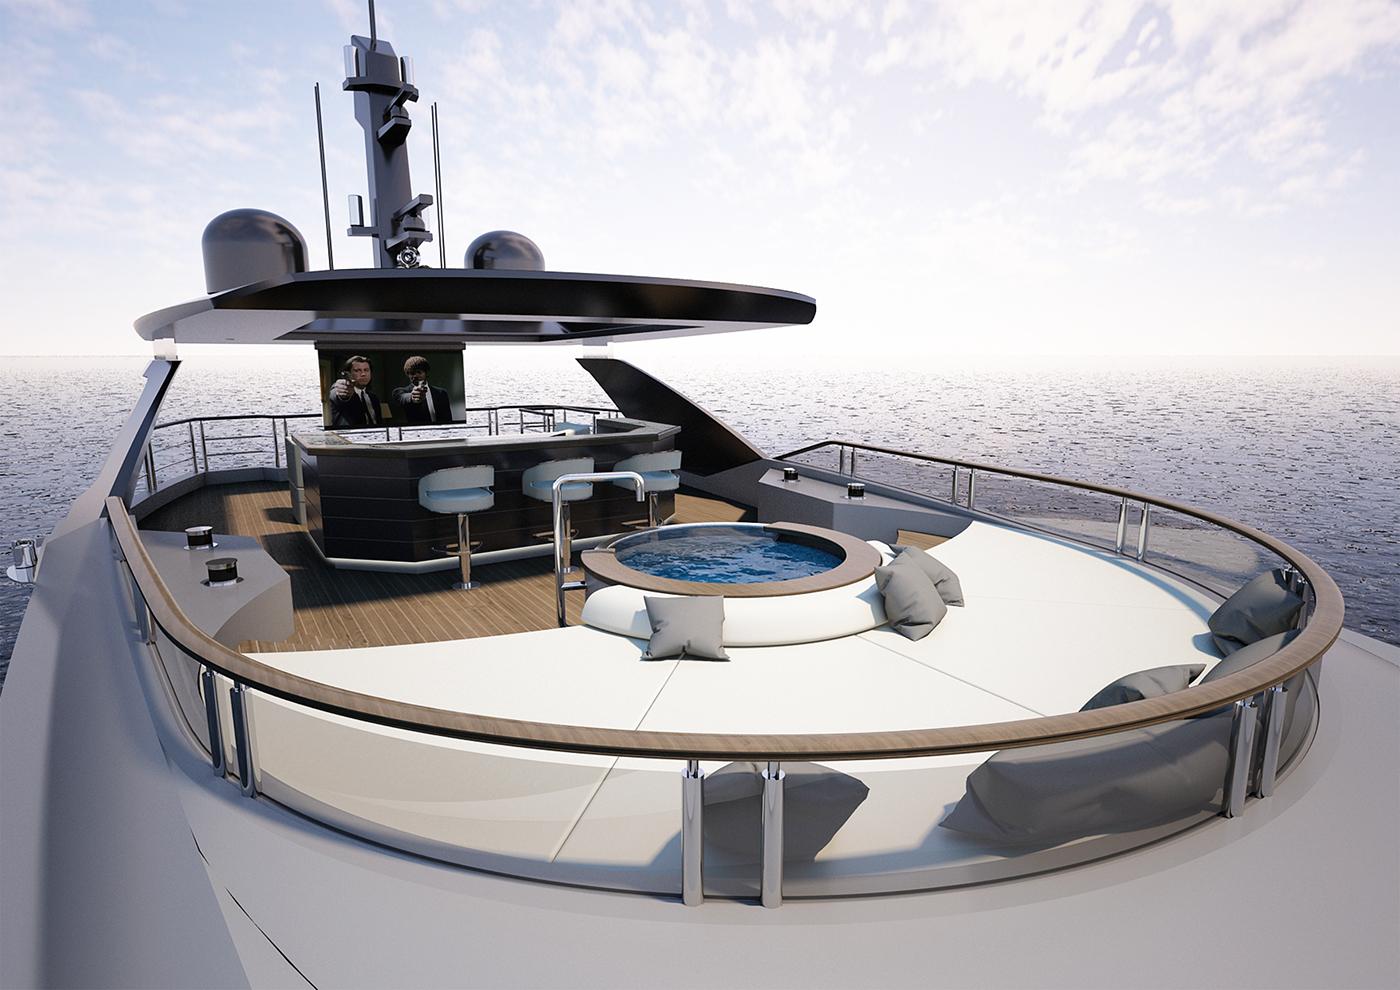 Greywolf 40m Explorer Yacht Design Project on Behance